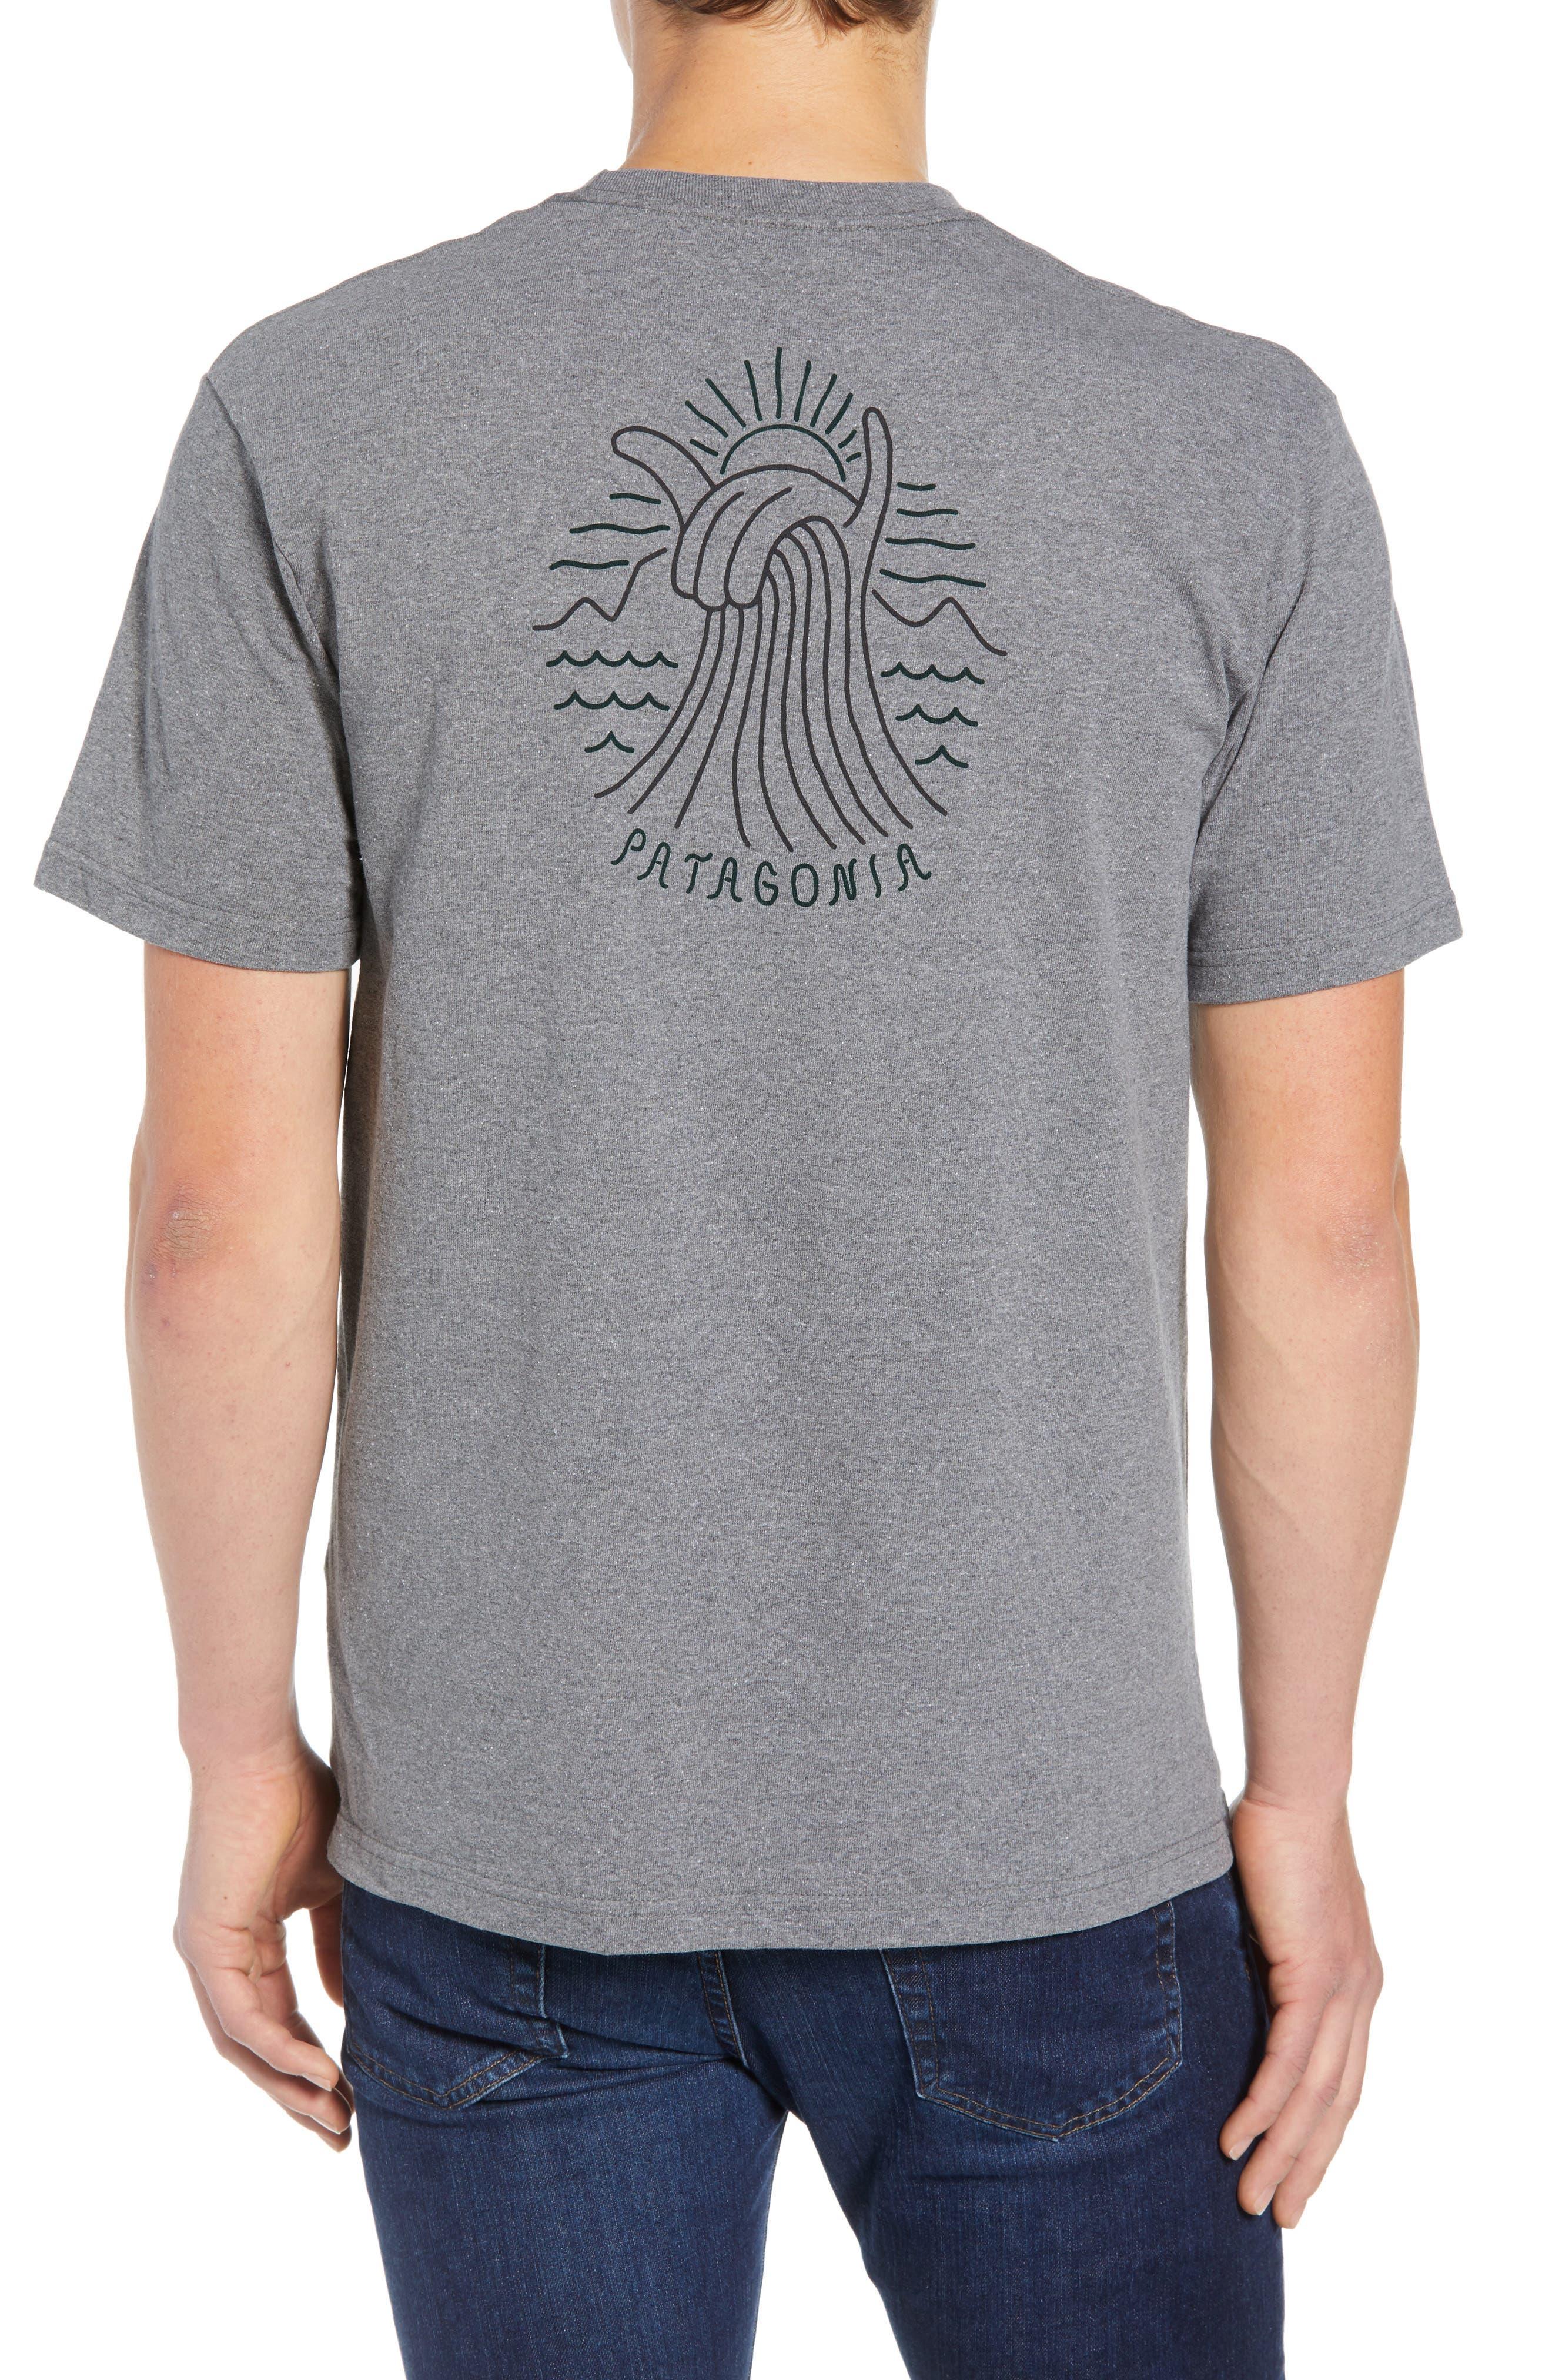 Shaka Wave Slim Fit T-Shirt,                             Alternate thumbnail 2, color,                             GRAVEL HEATHER